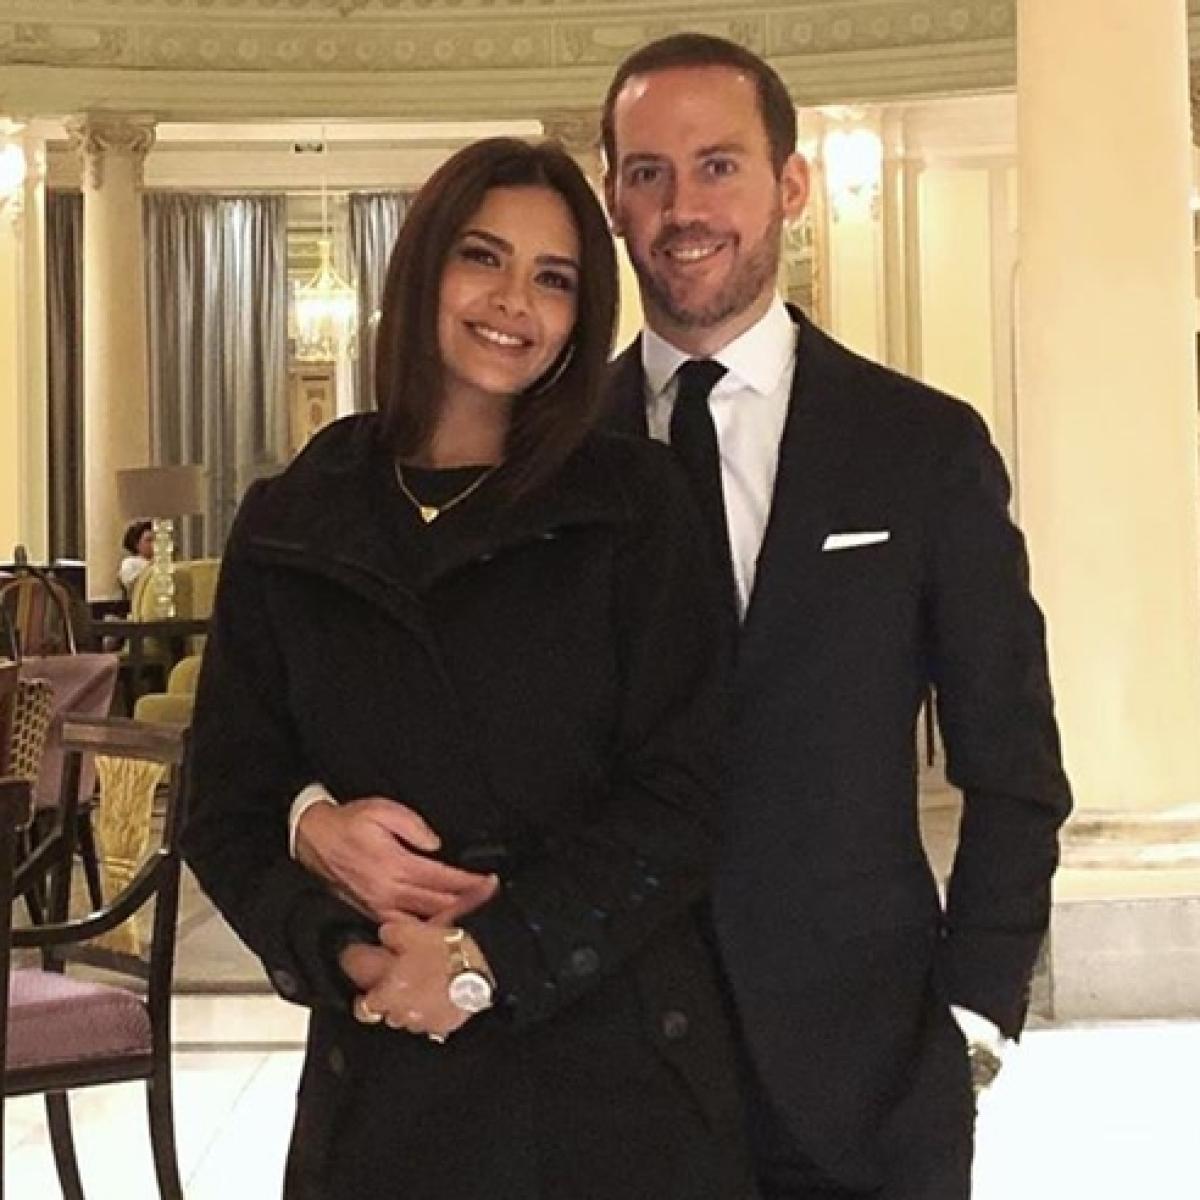 Esha Gupta makes relationship Instagram official with Spanish boyfriend Manuel Campos Guallar